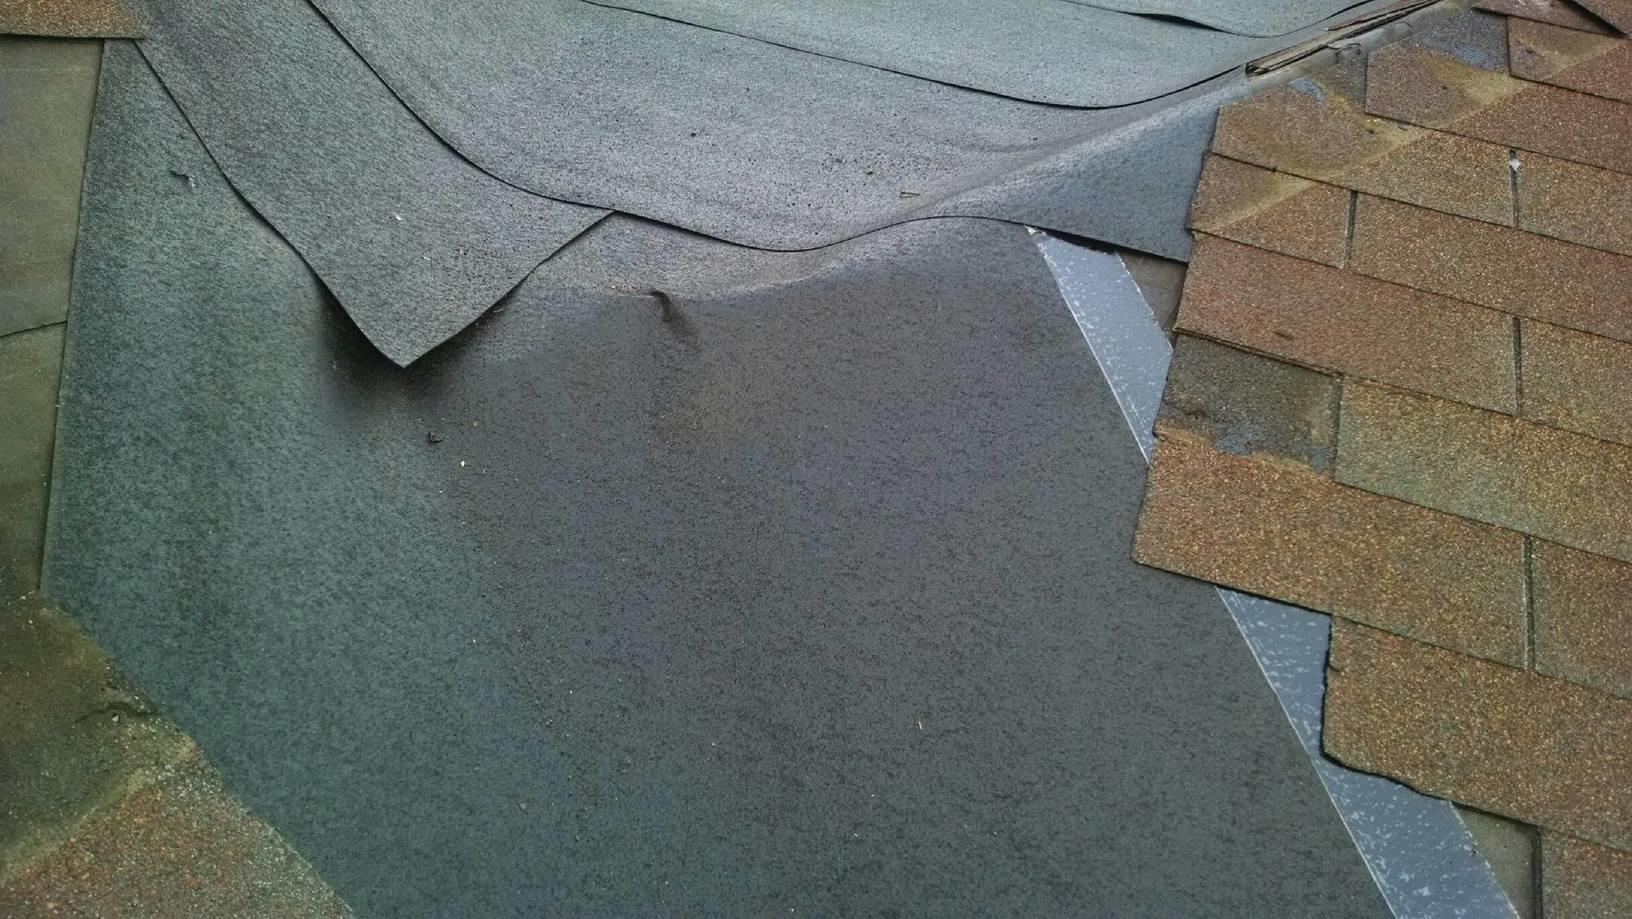 Leaky Roof